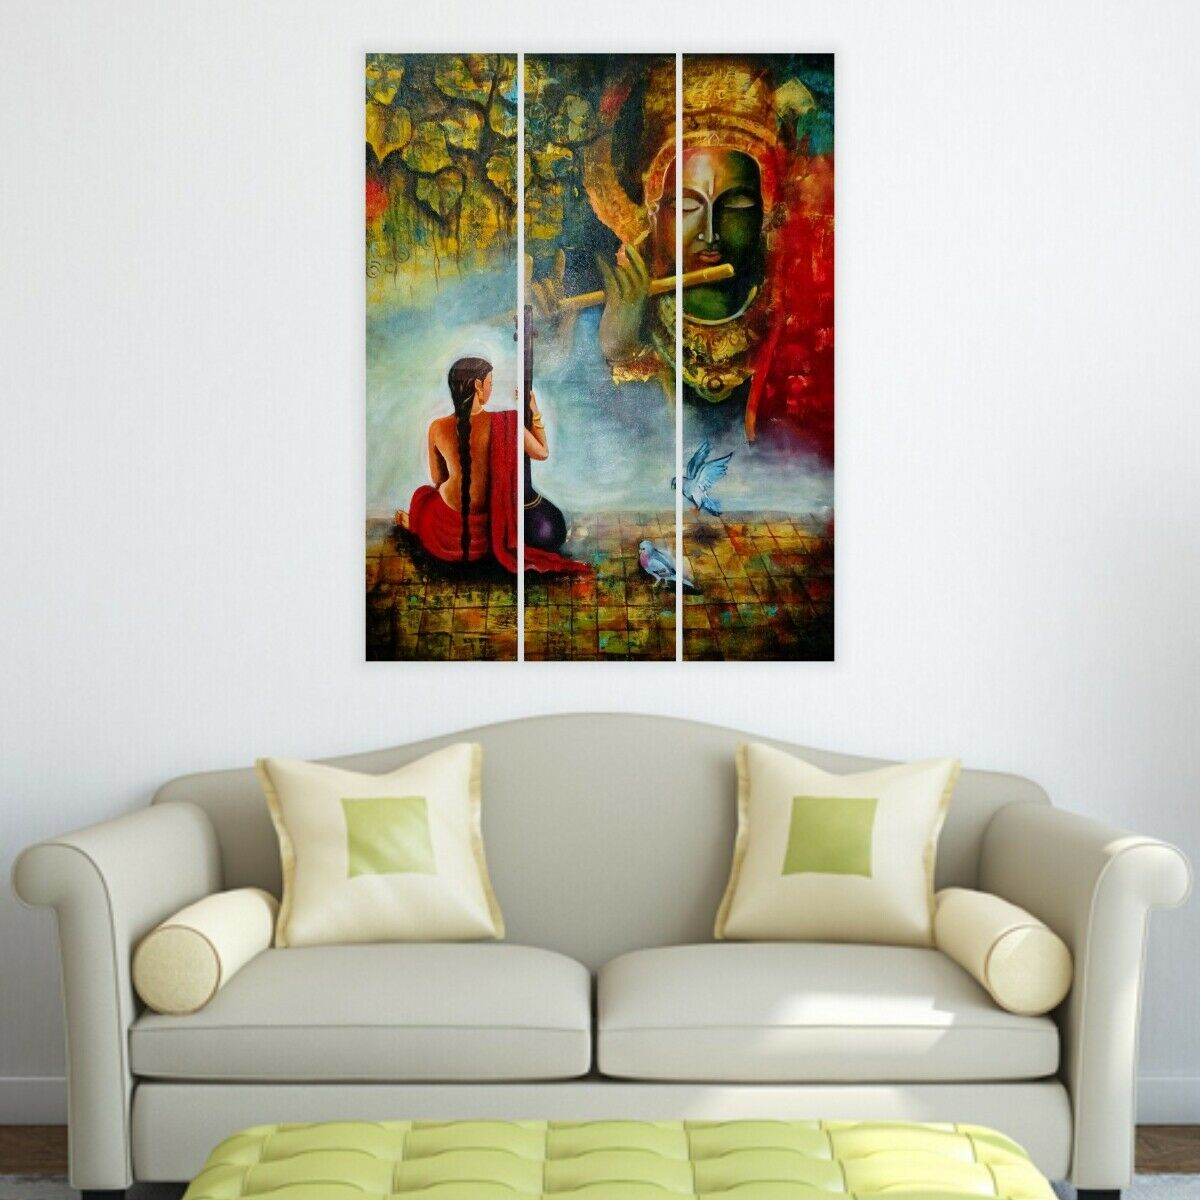 Lord Krishna-Split Image 3 panneaux pour salon murs  144 - hktpic-UK